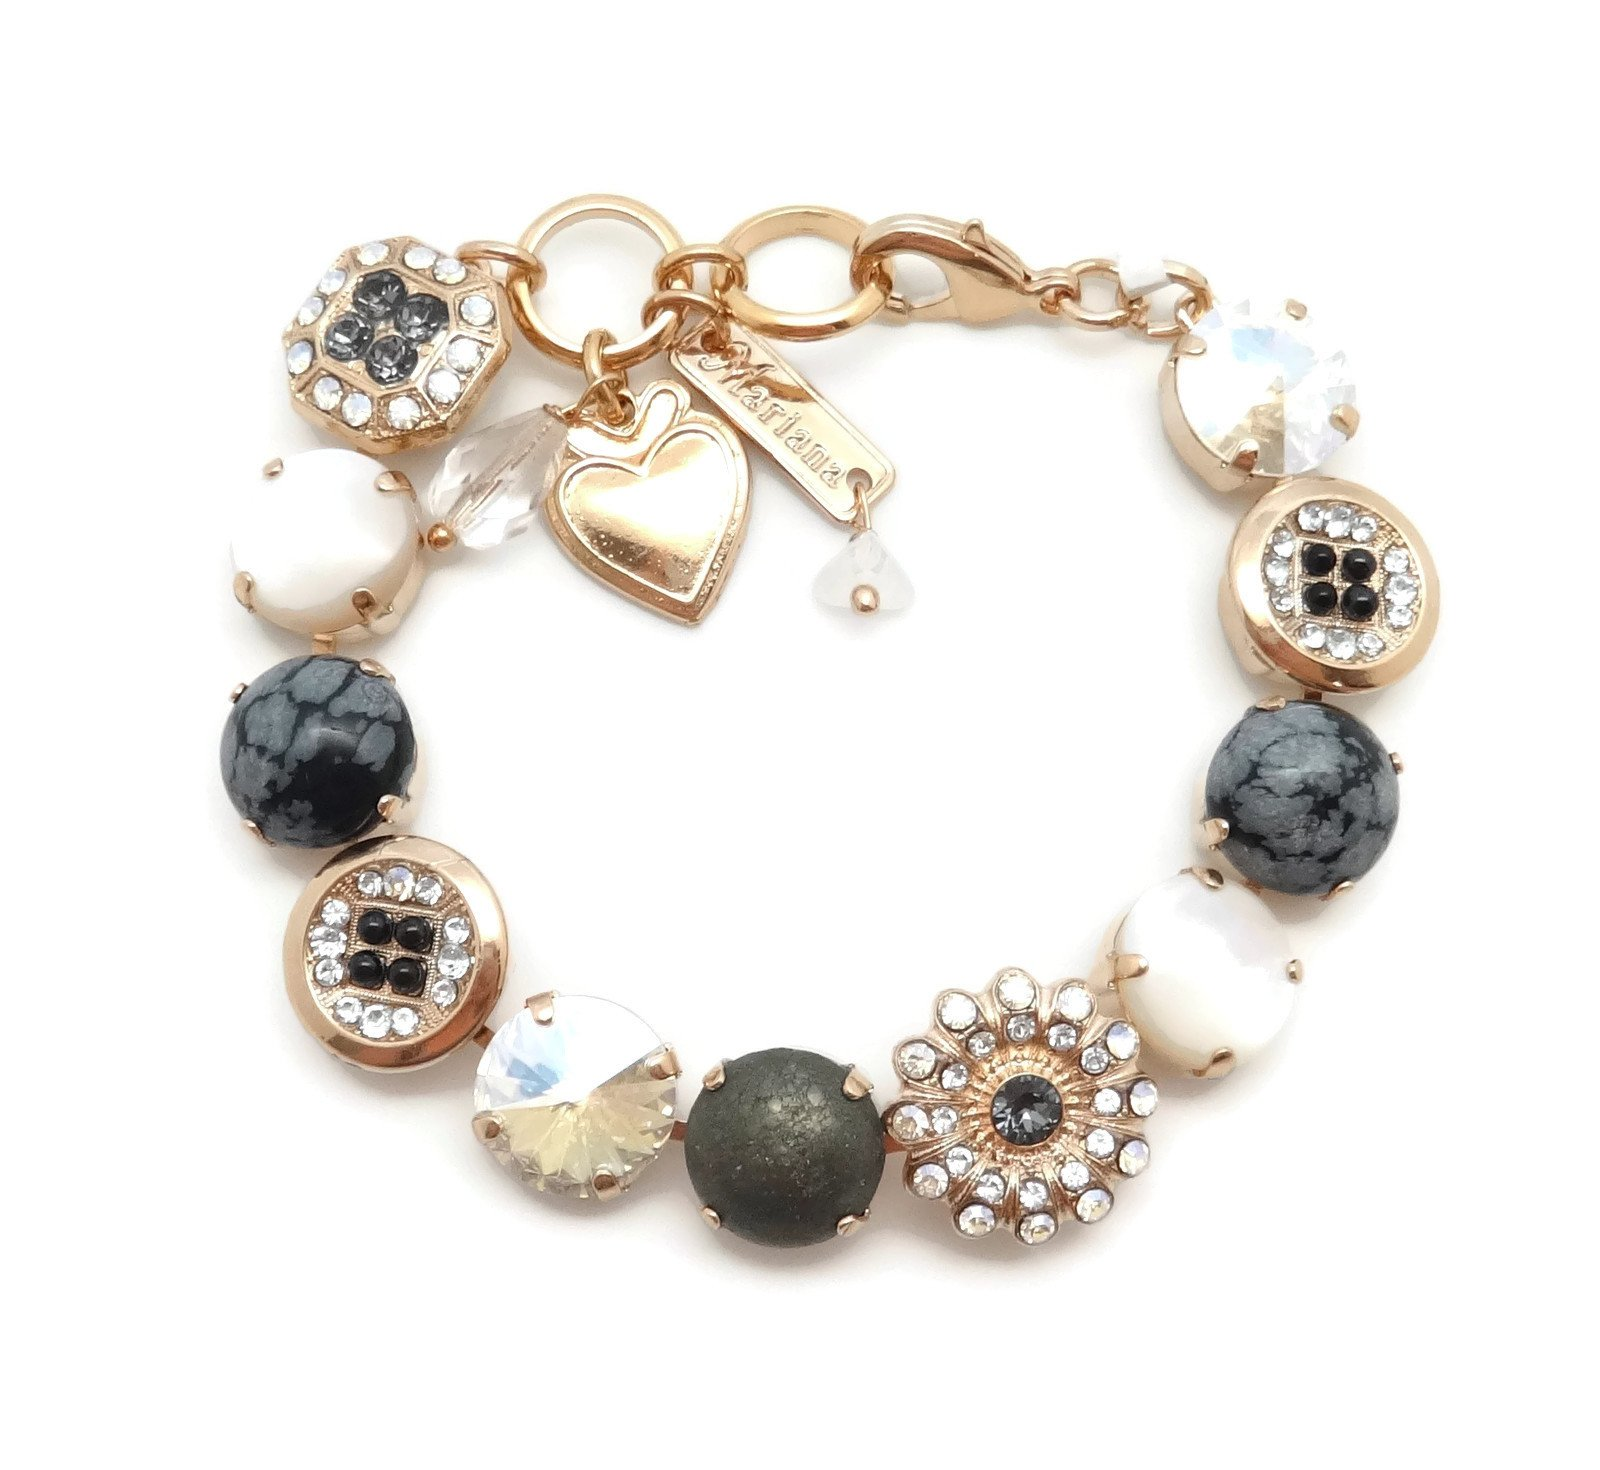 Mariana Rose Gold Plated Swarovski Crystal & Mineral Stone Bracelet Black Grey & White Mosaic M1080 Zulu